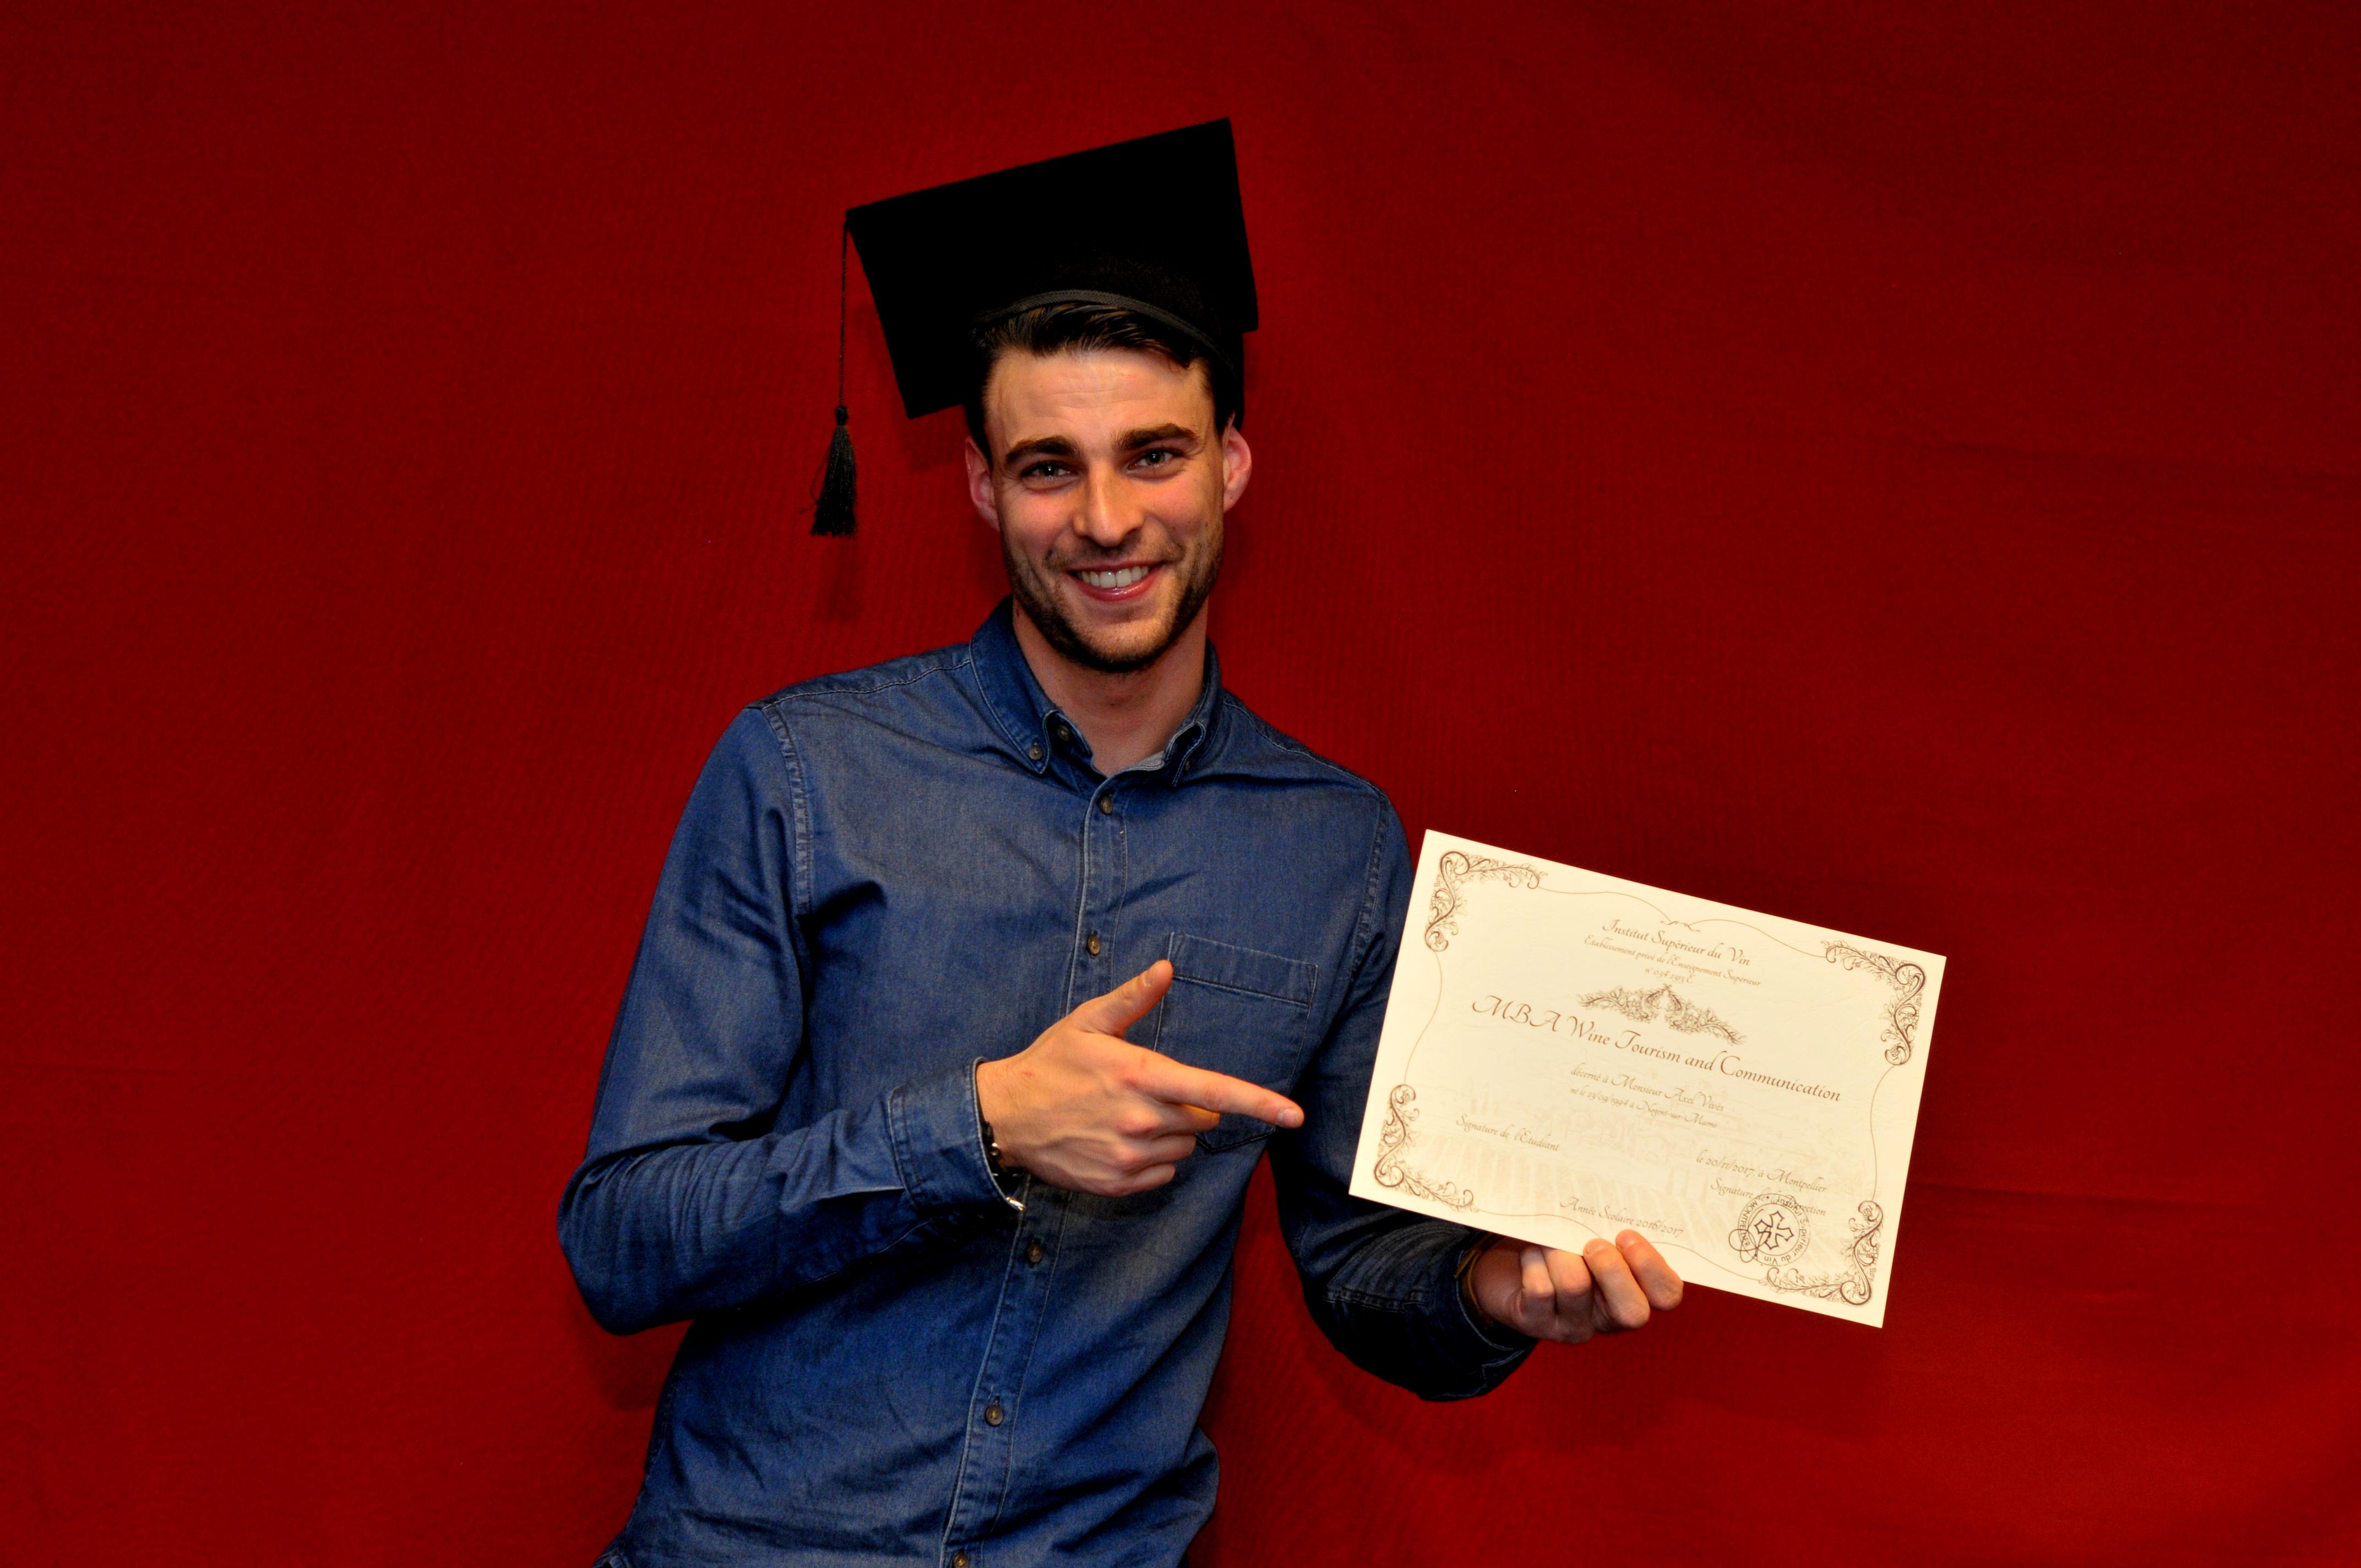 Remise des diplomes124